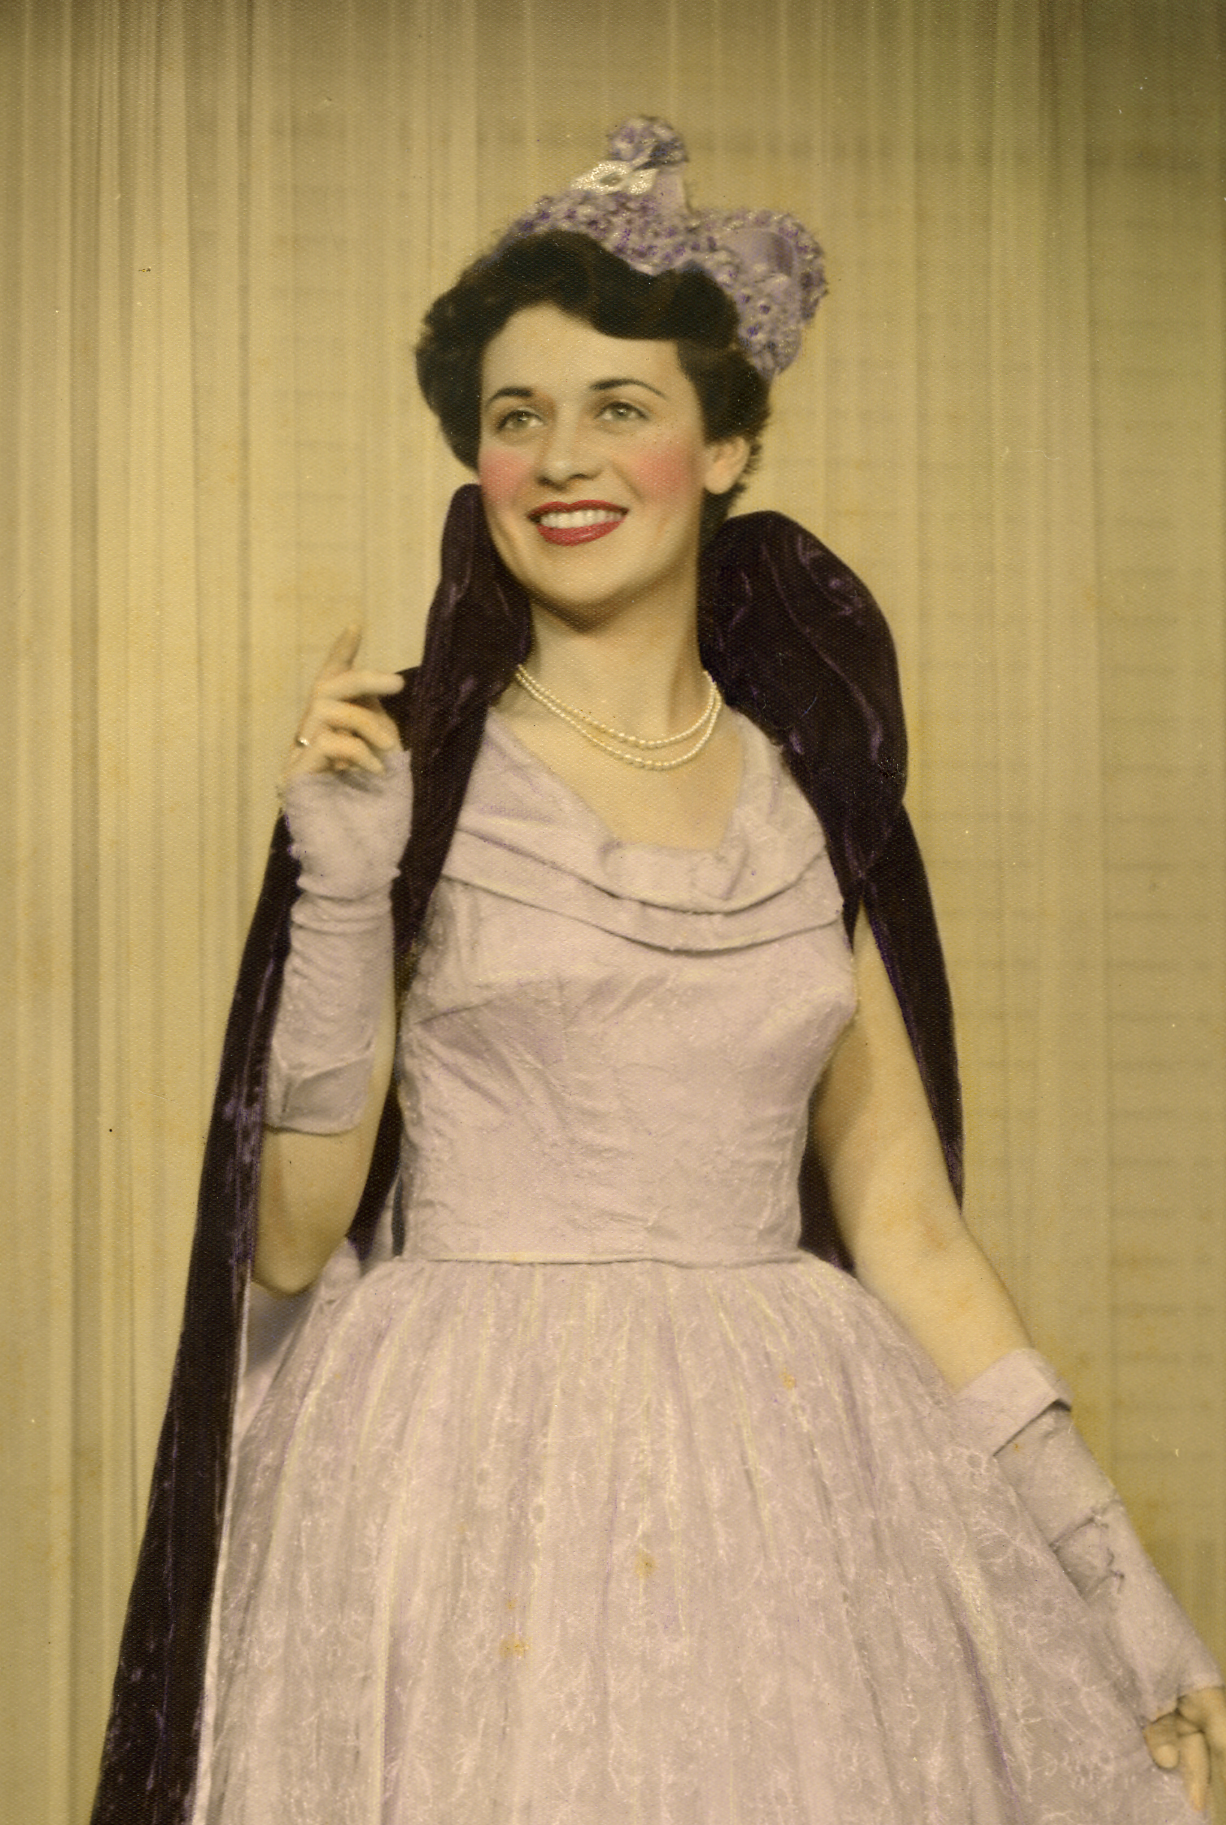 Nanette Ravenscroft